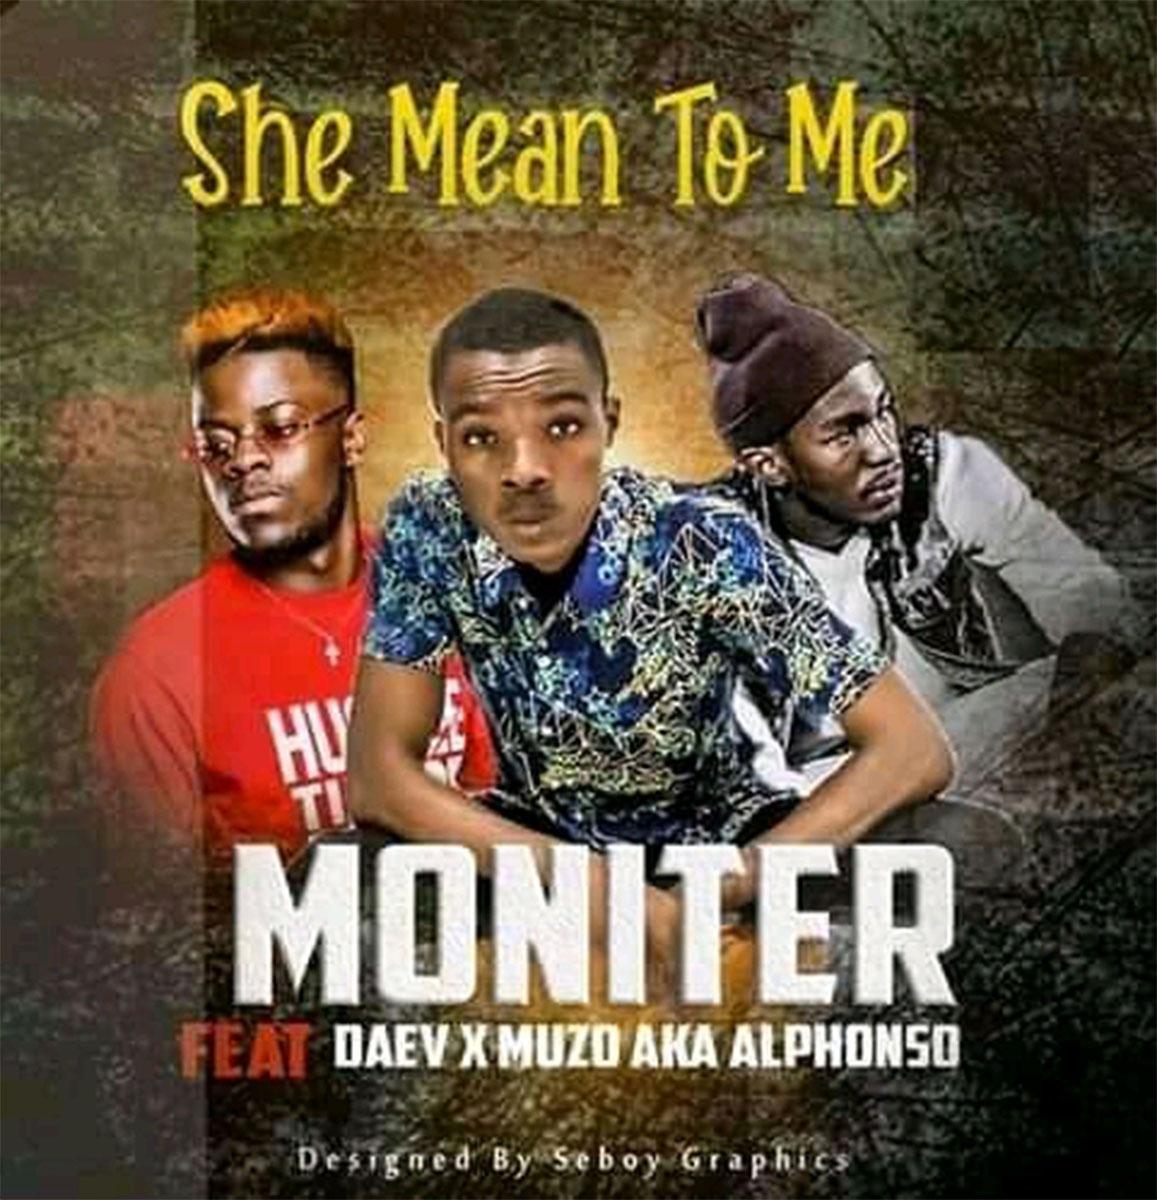 Moniter ft. Daev & Muzo AKA Alphonso - She Mean To Me